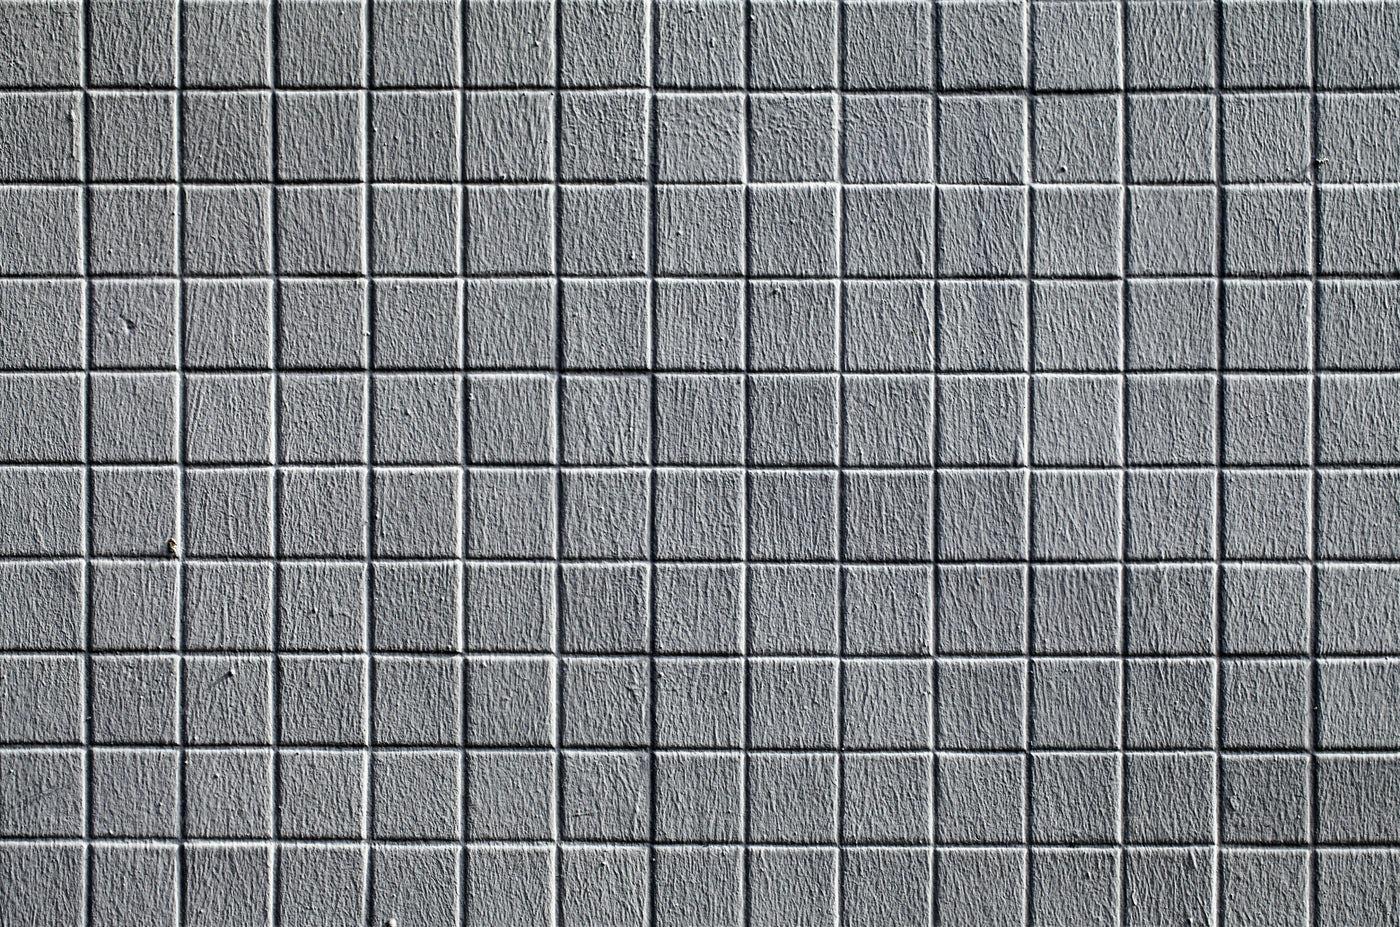 Gray Brick Wall Background: Stock Photos